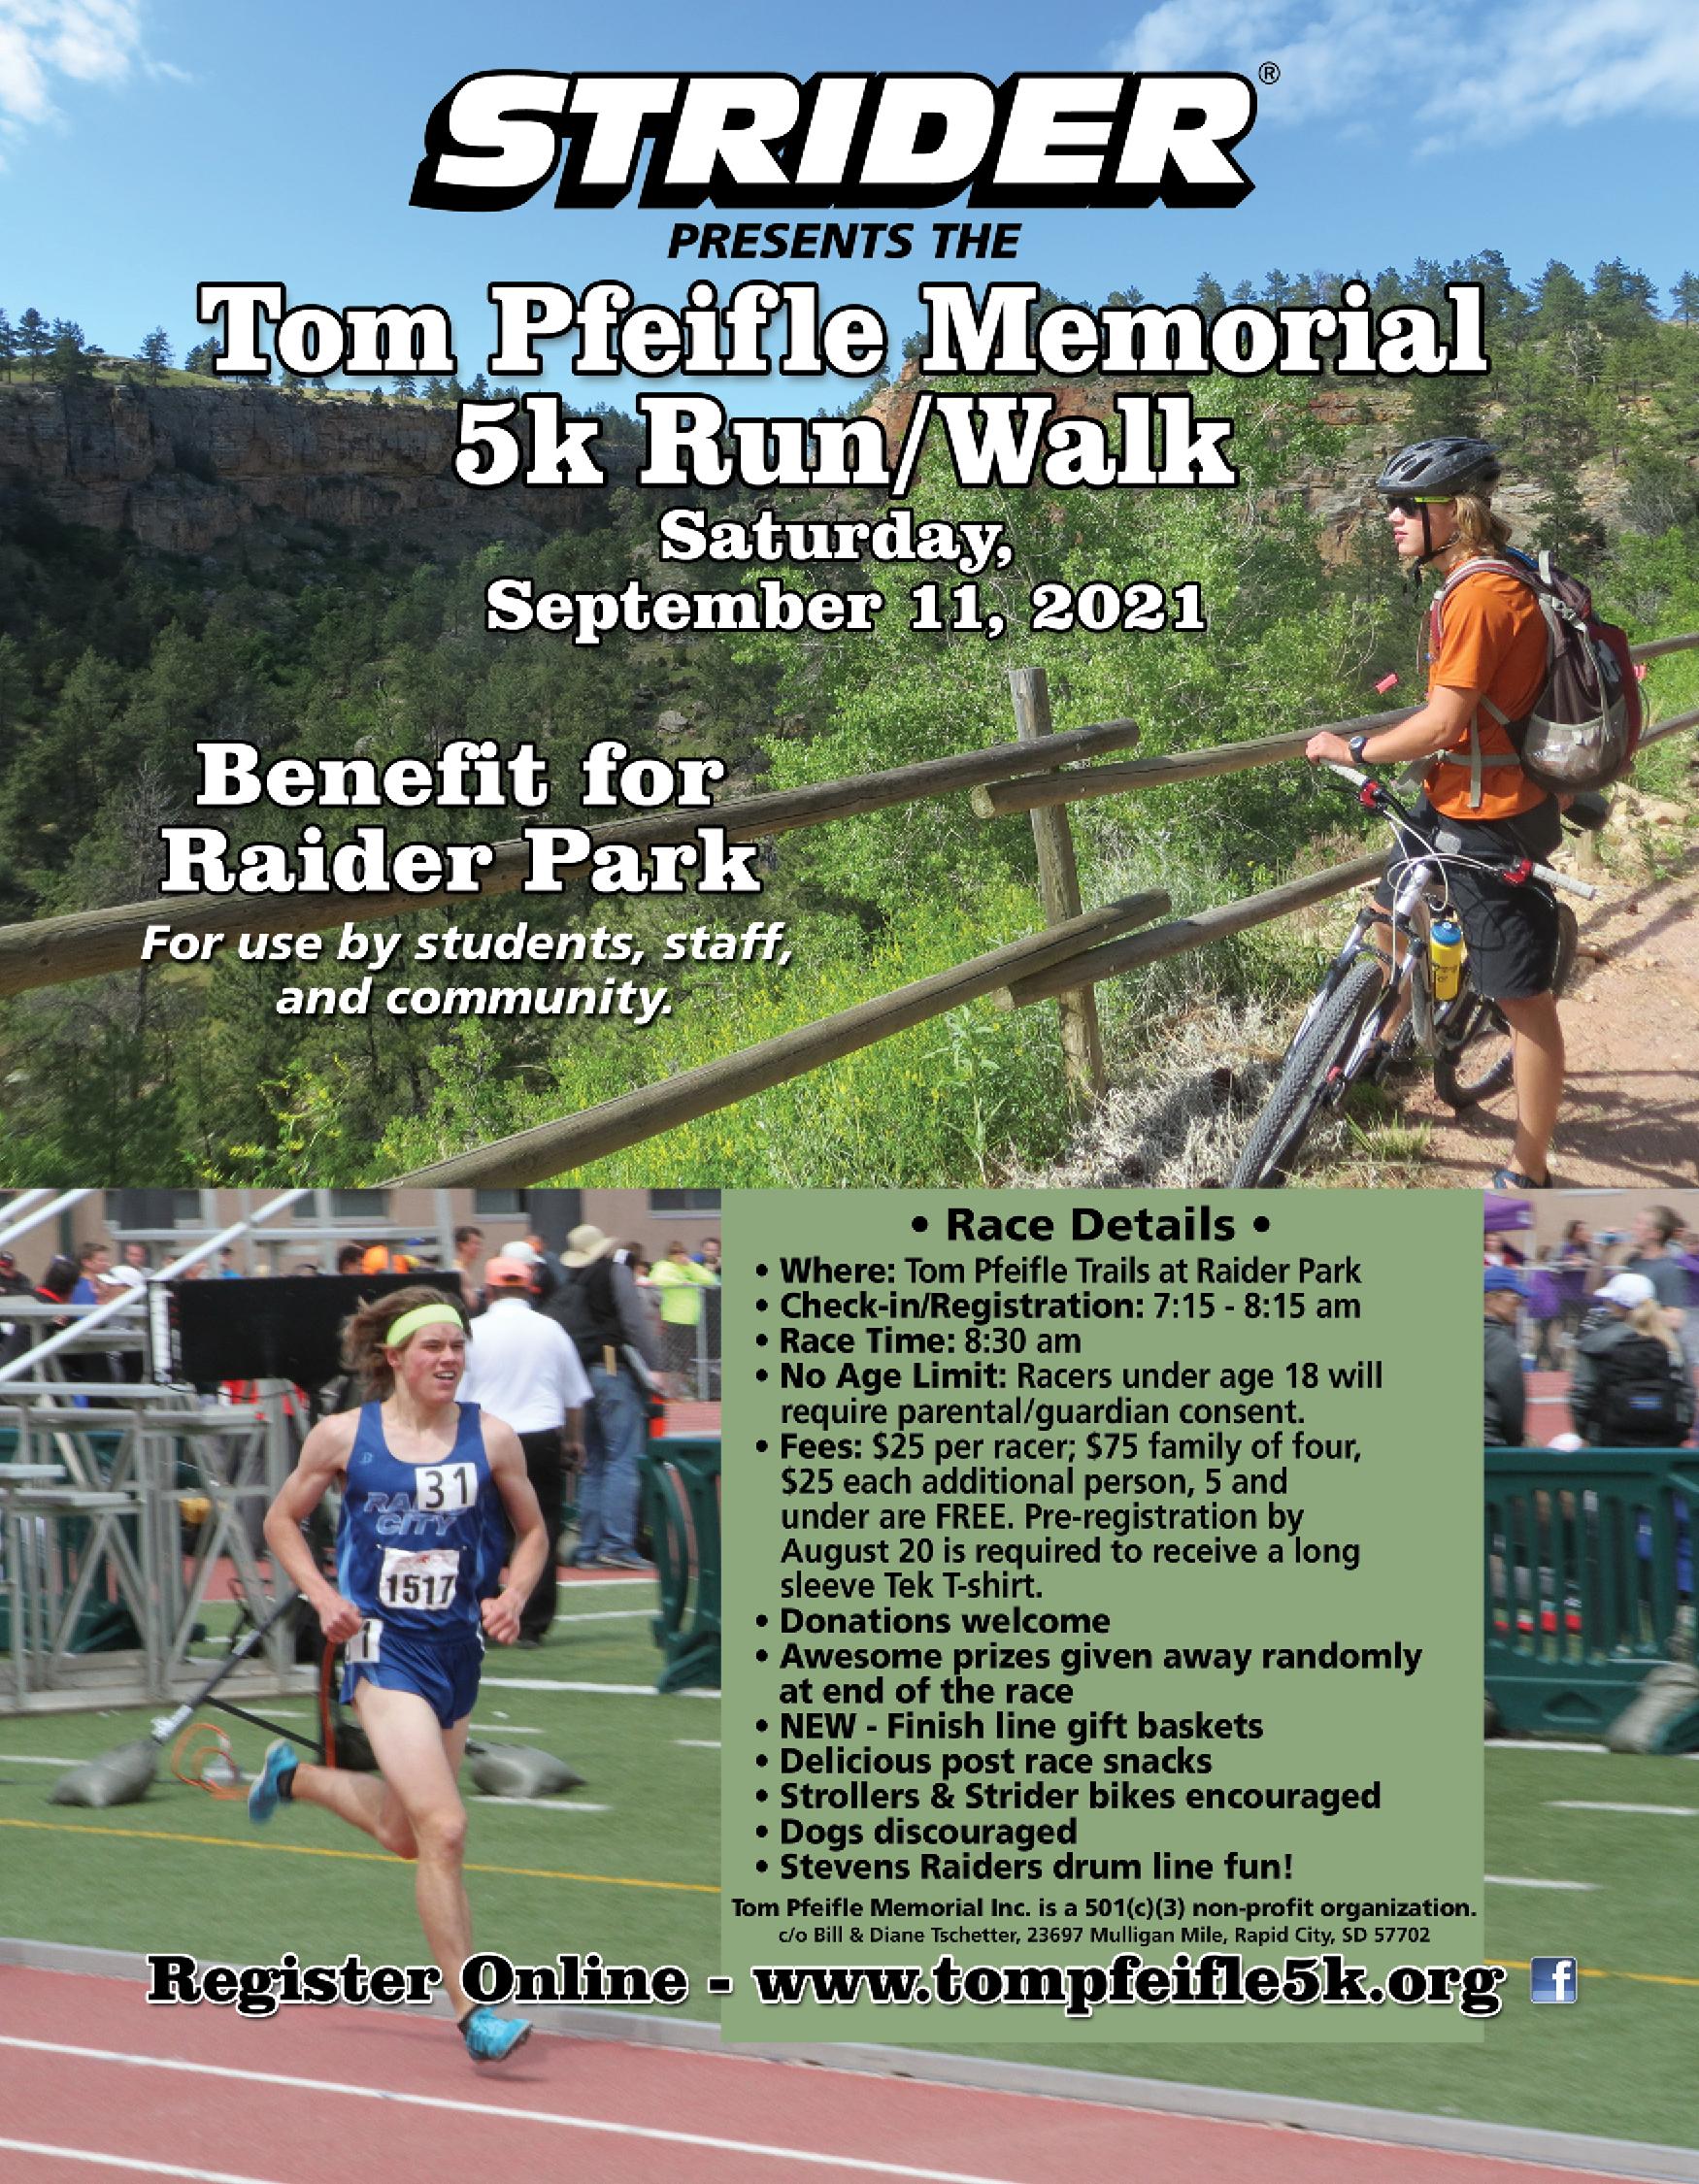 Strider presents tom pfeifle memorial 5k run/walk